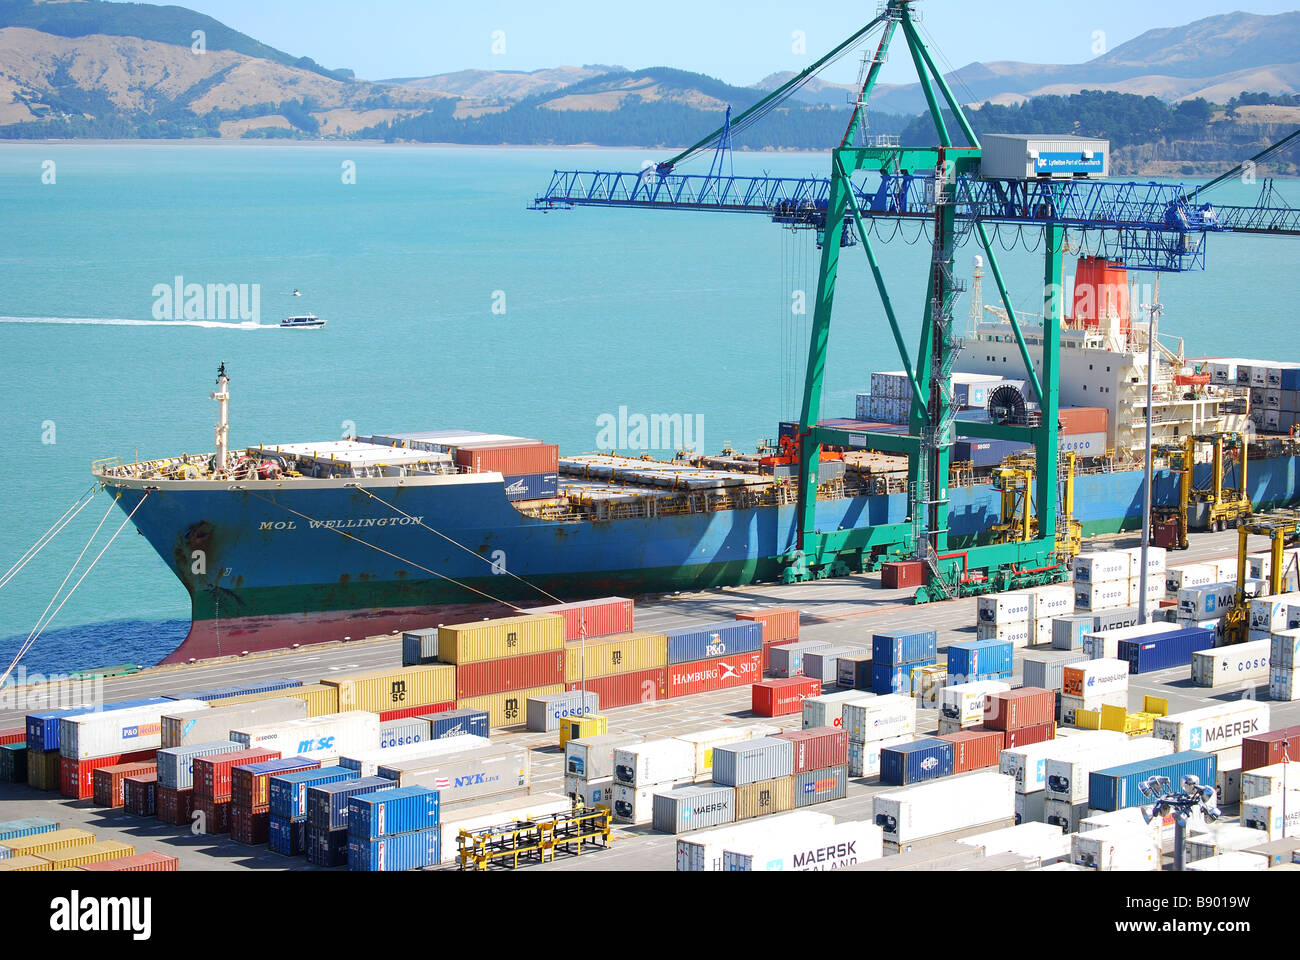 Container ship loading at Lyttelton, Lyttelton Harbour, Bank's Peninsula, Canterbury, South Island, New Zealand - Stock Image